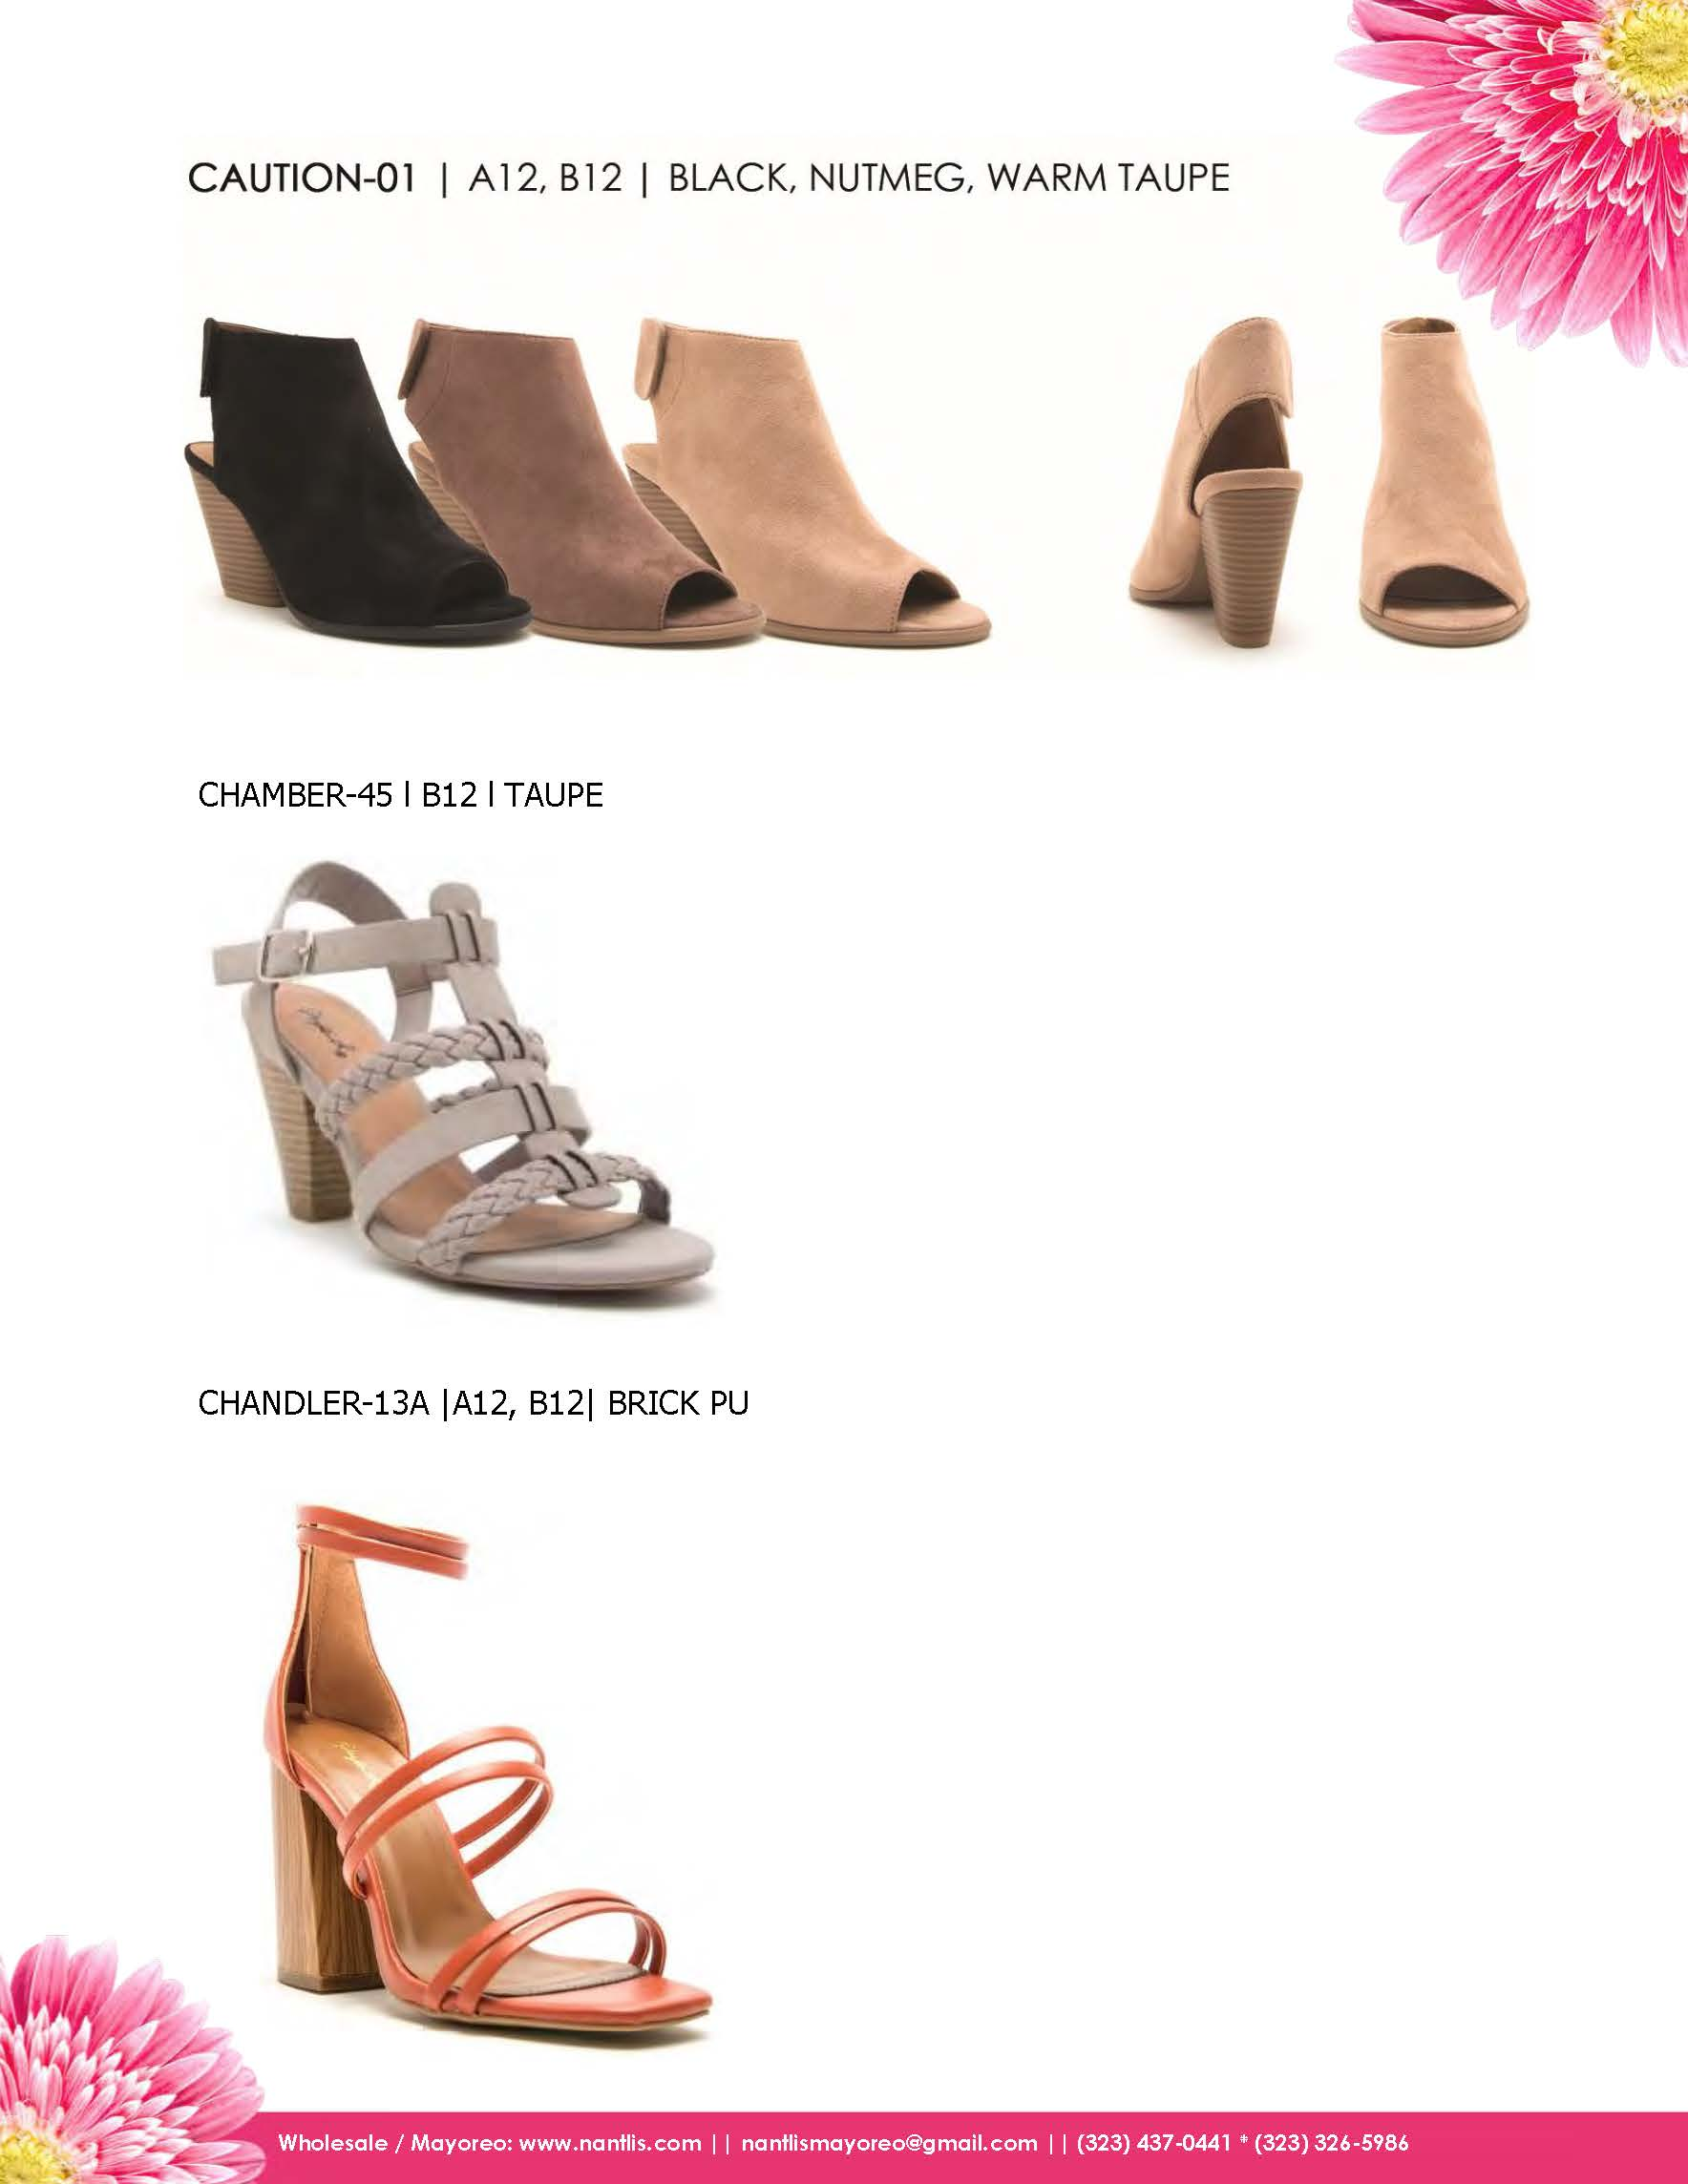 Nantlis Vol QU43 Zapatos para mujer mayoreo Wholesale shoes for women_Page_12